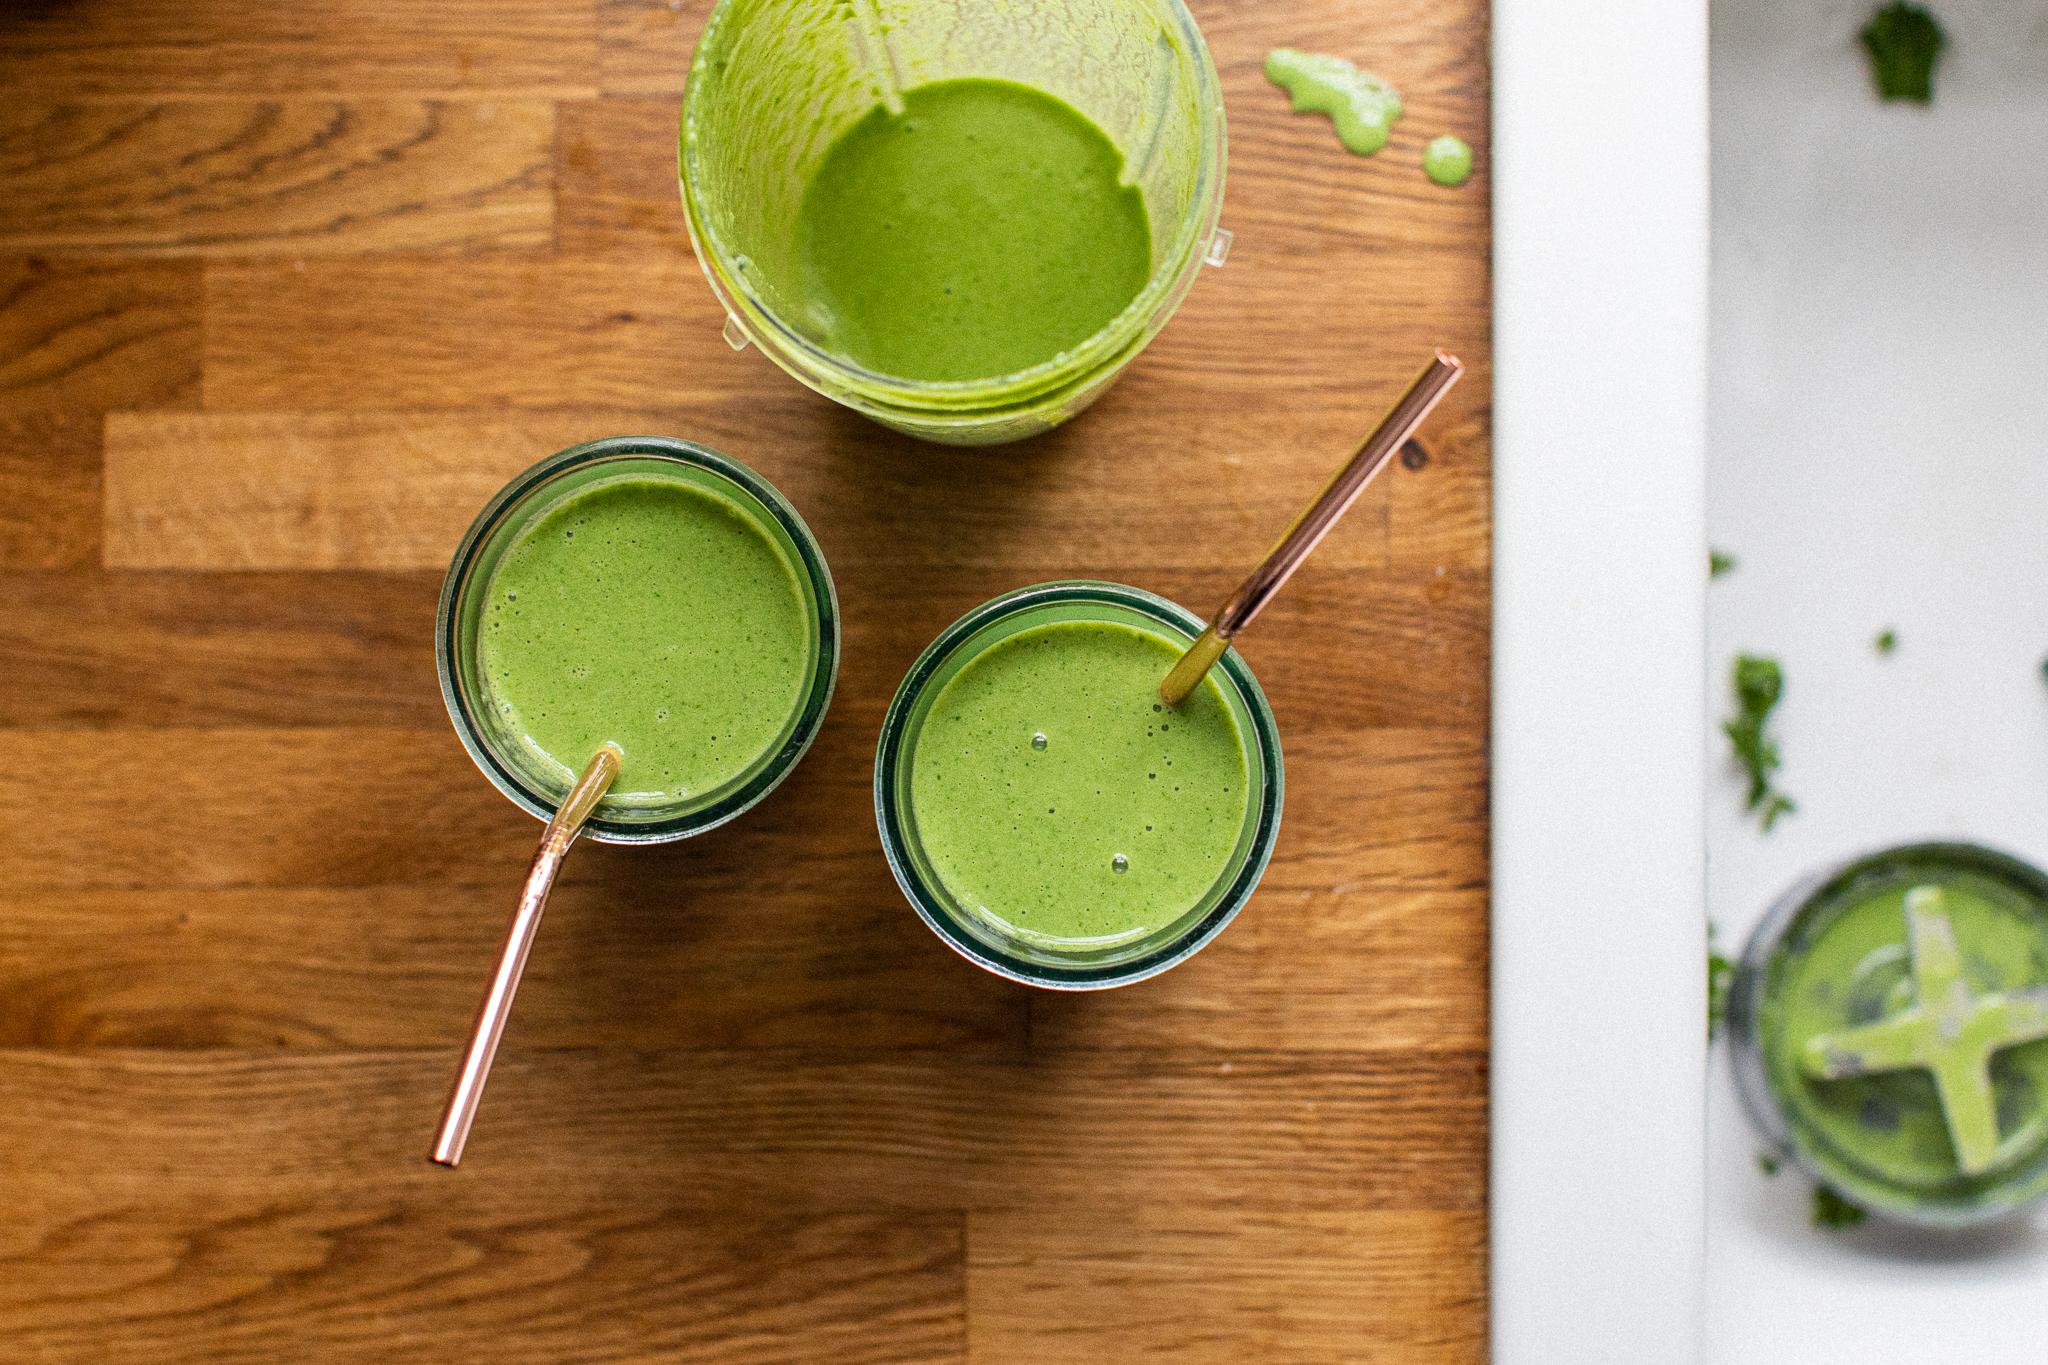 Low FODMAP green smoothie